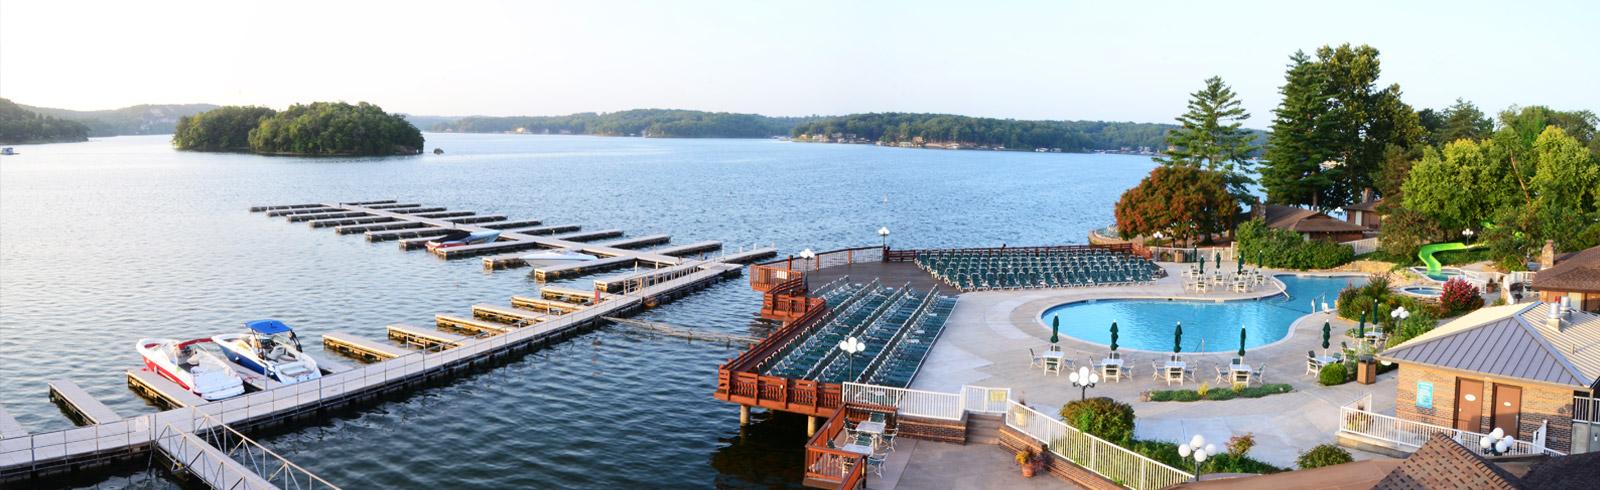 Margaritaville Lake Resort Lake of the Ozarks - Employment